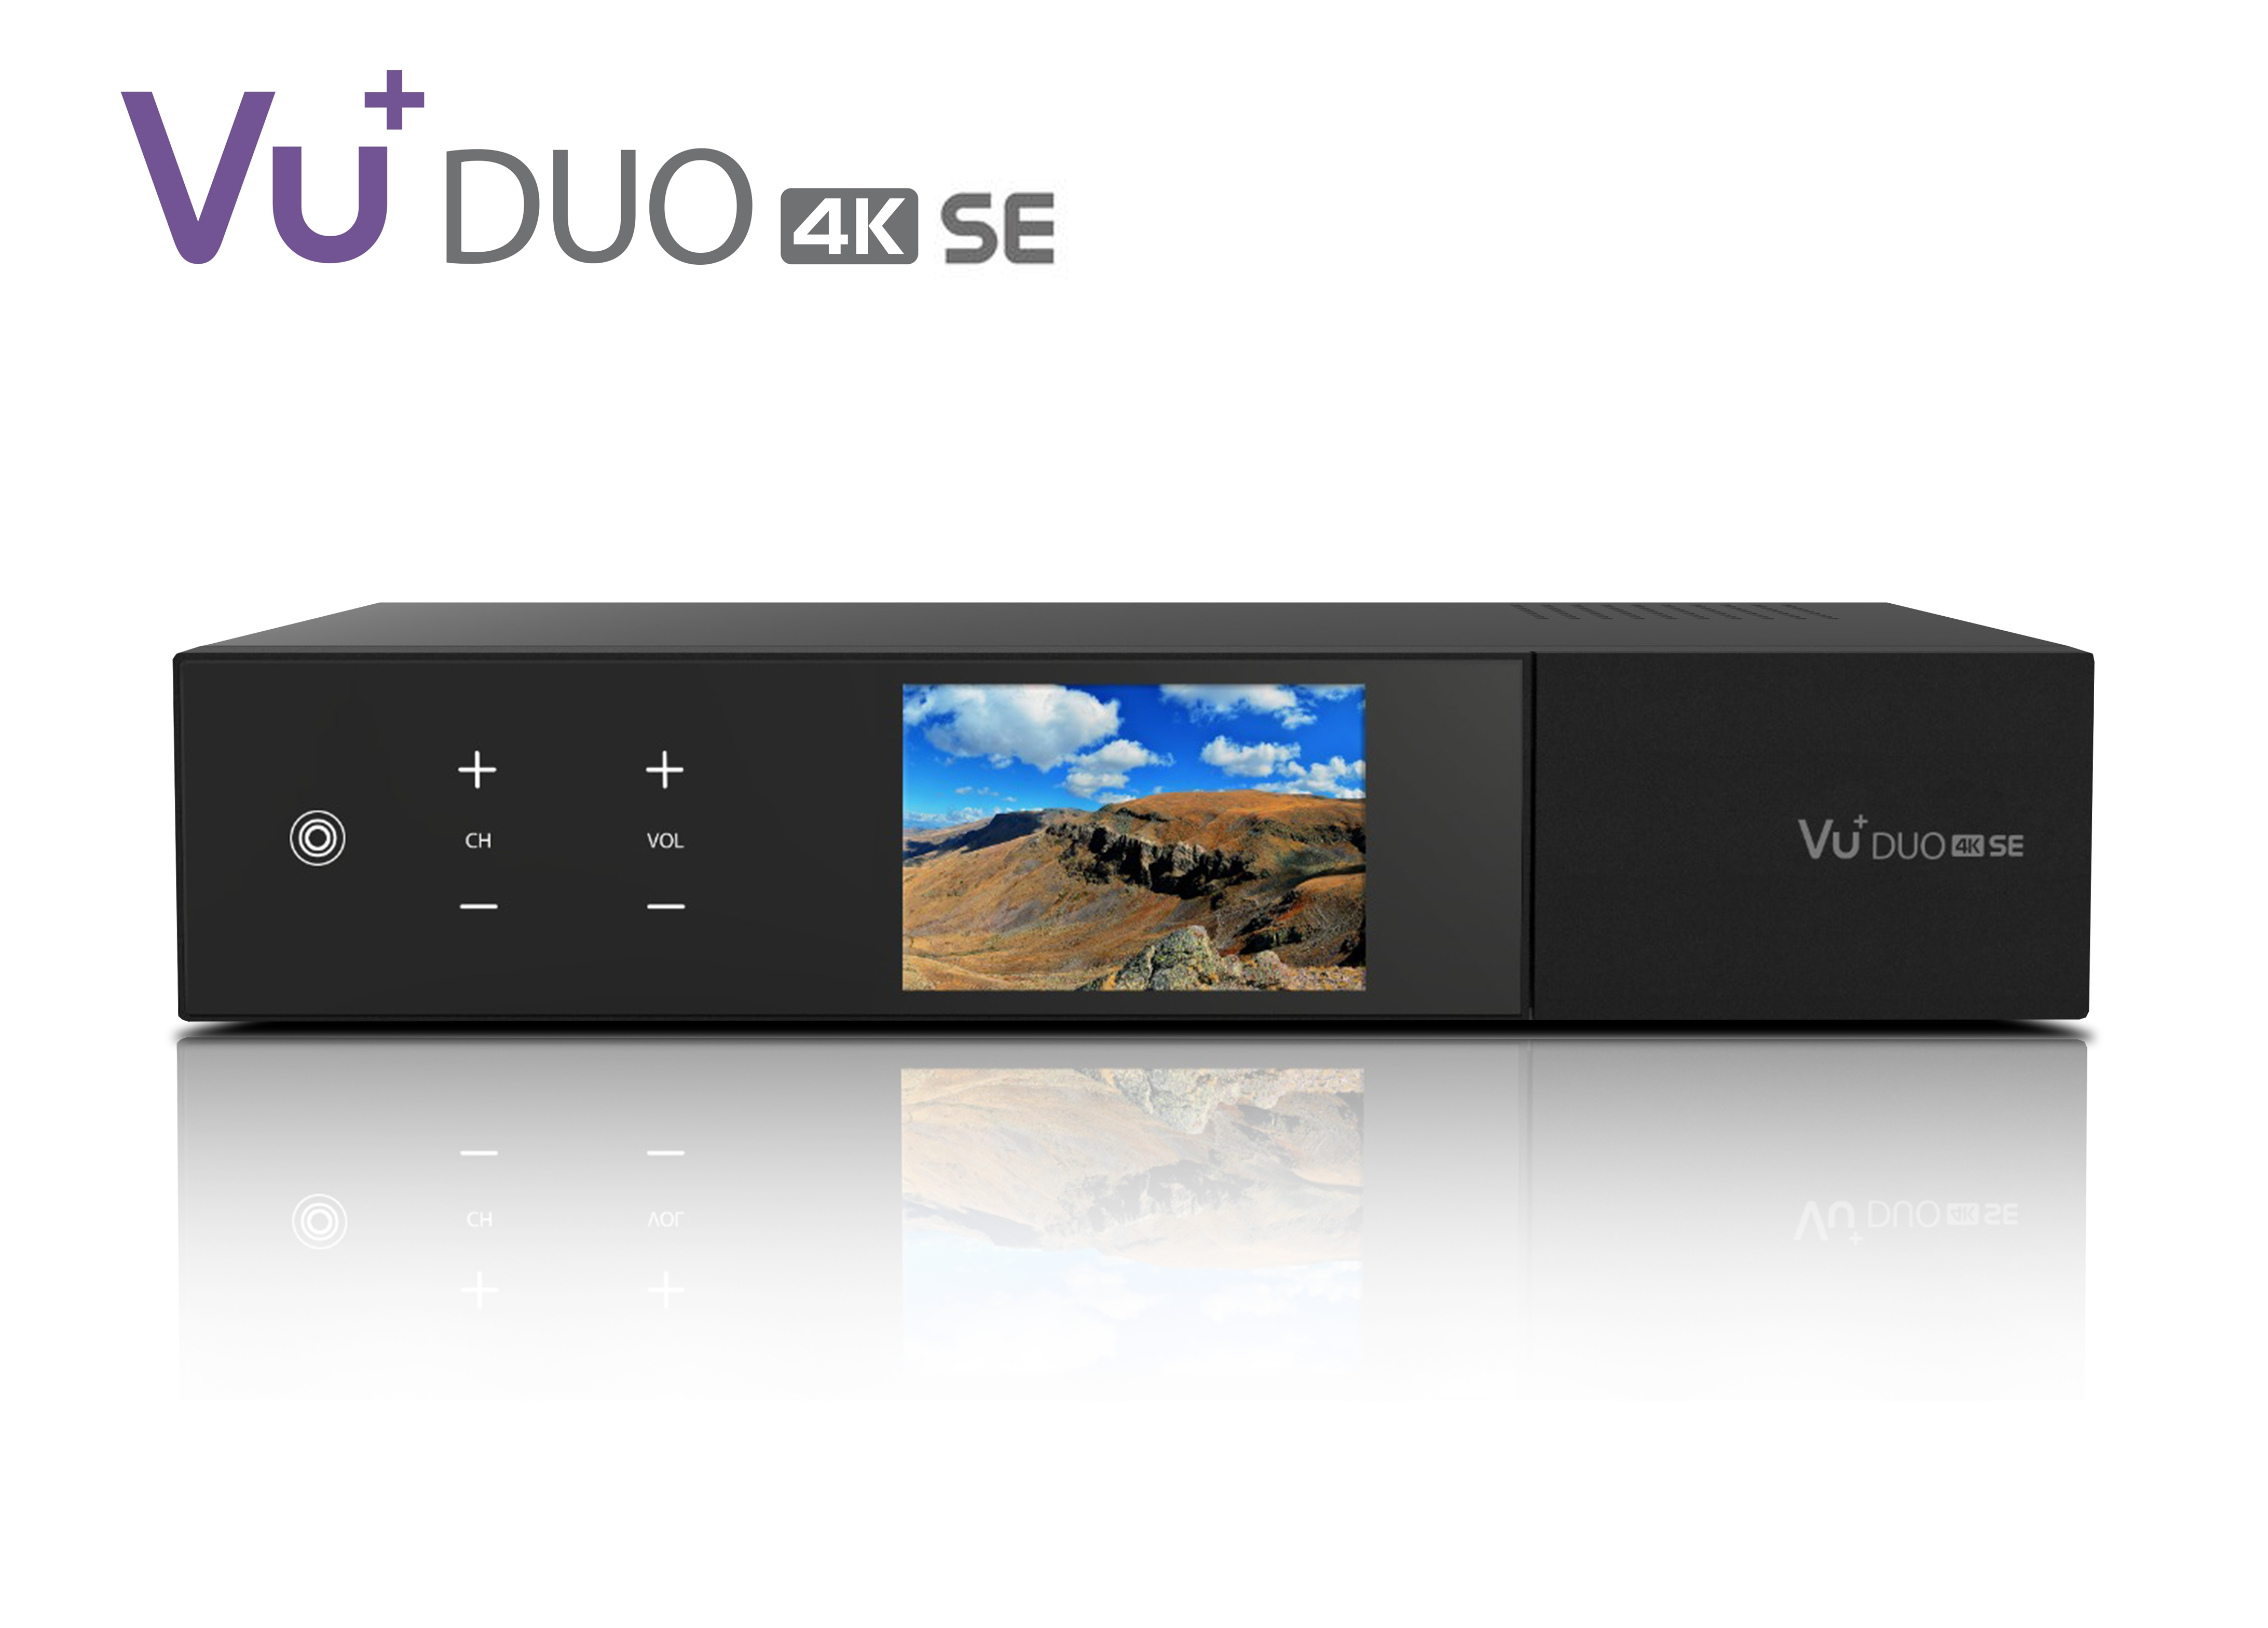 VU+ Duo 4K SE 1x DVB-C FBC Tuner 500 GB HDD Linux Receiver UHD 2160p